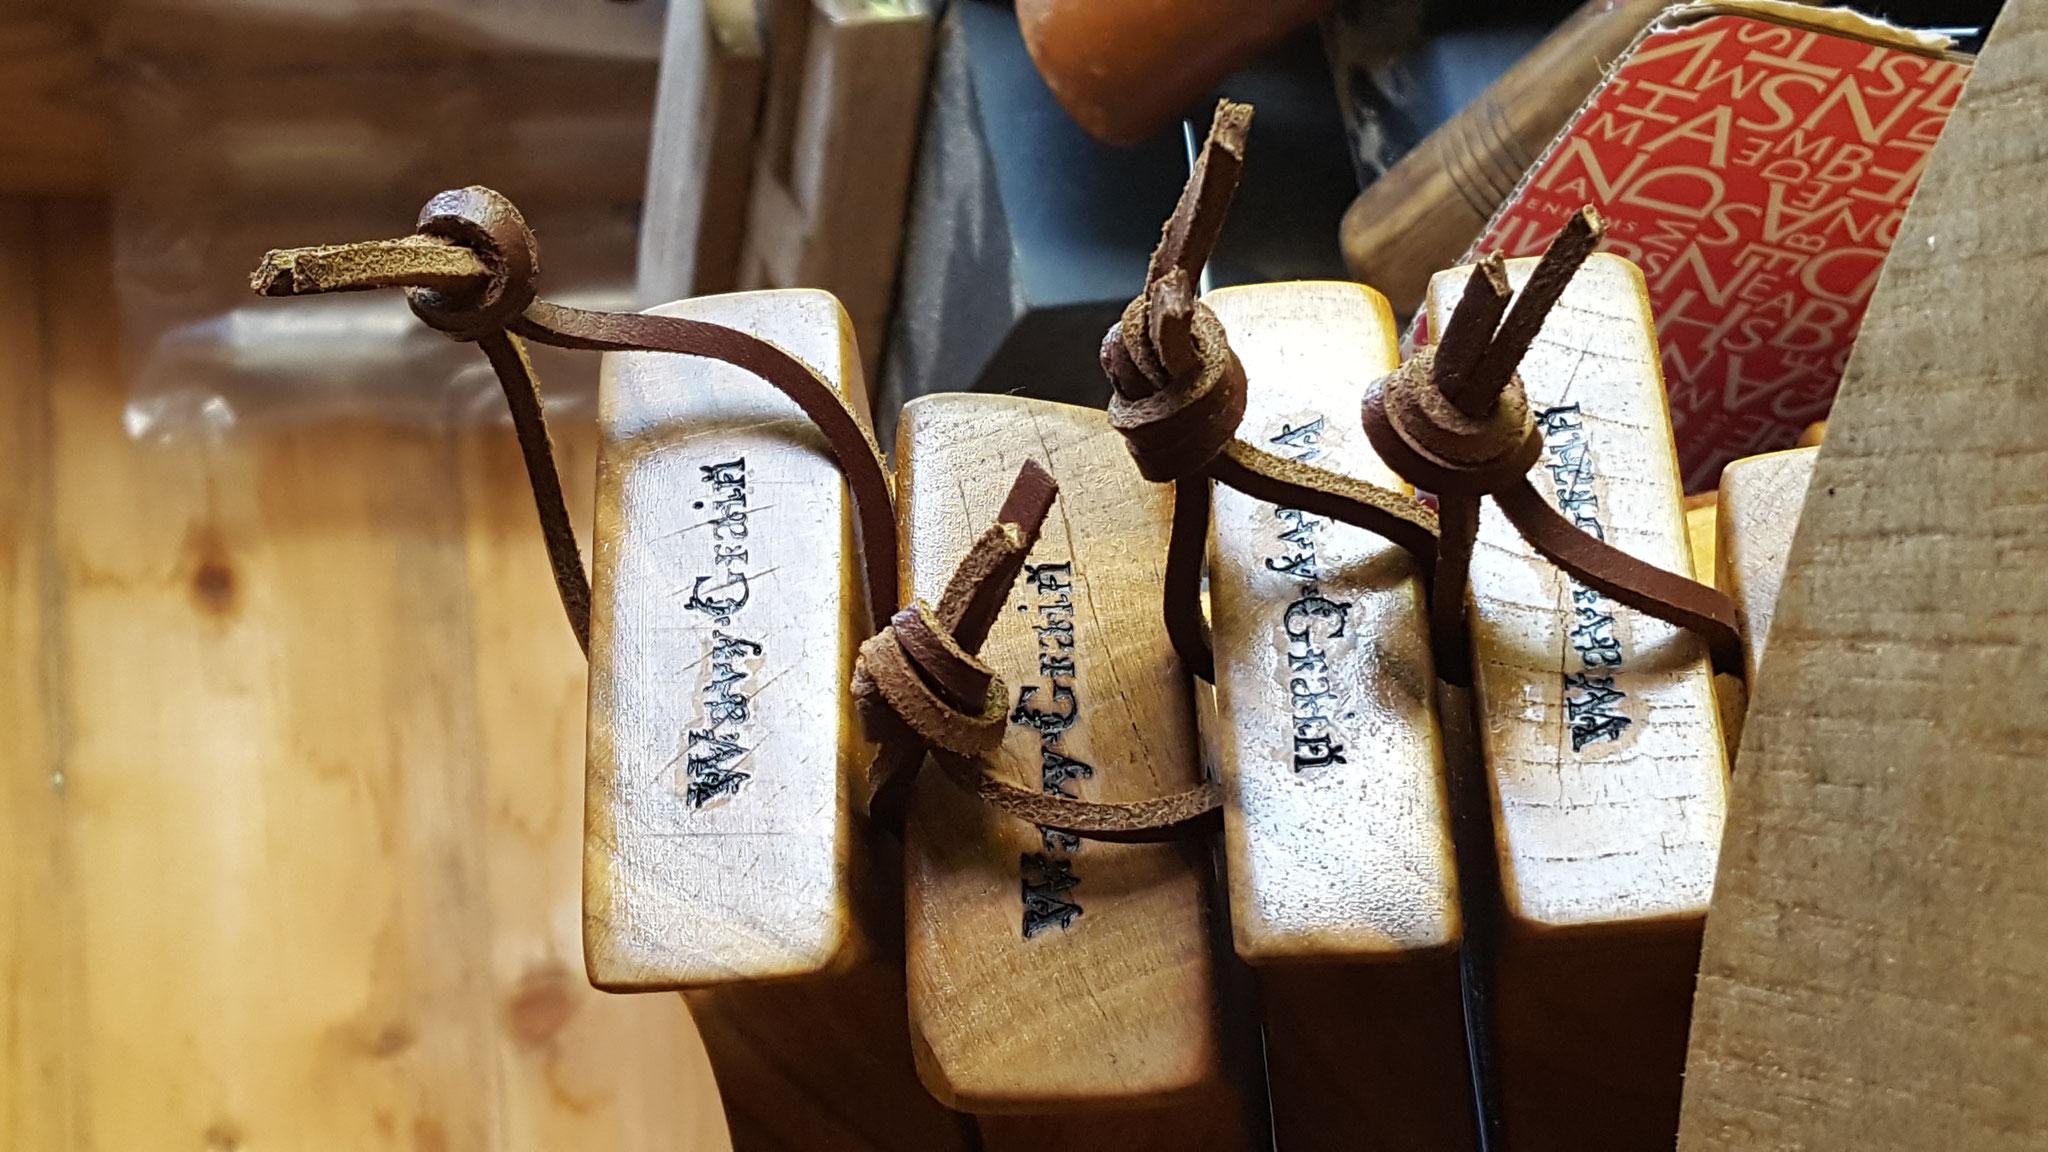 WavyGrain branded handmade